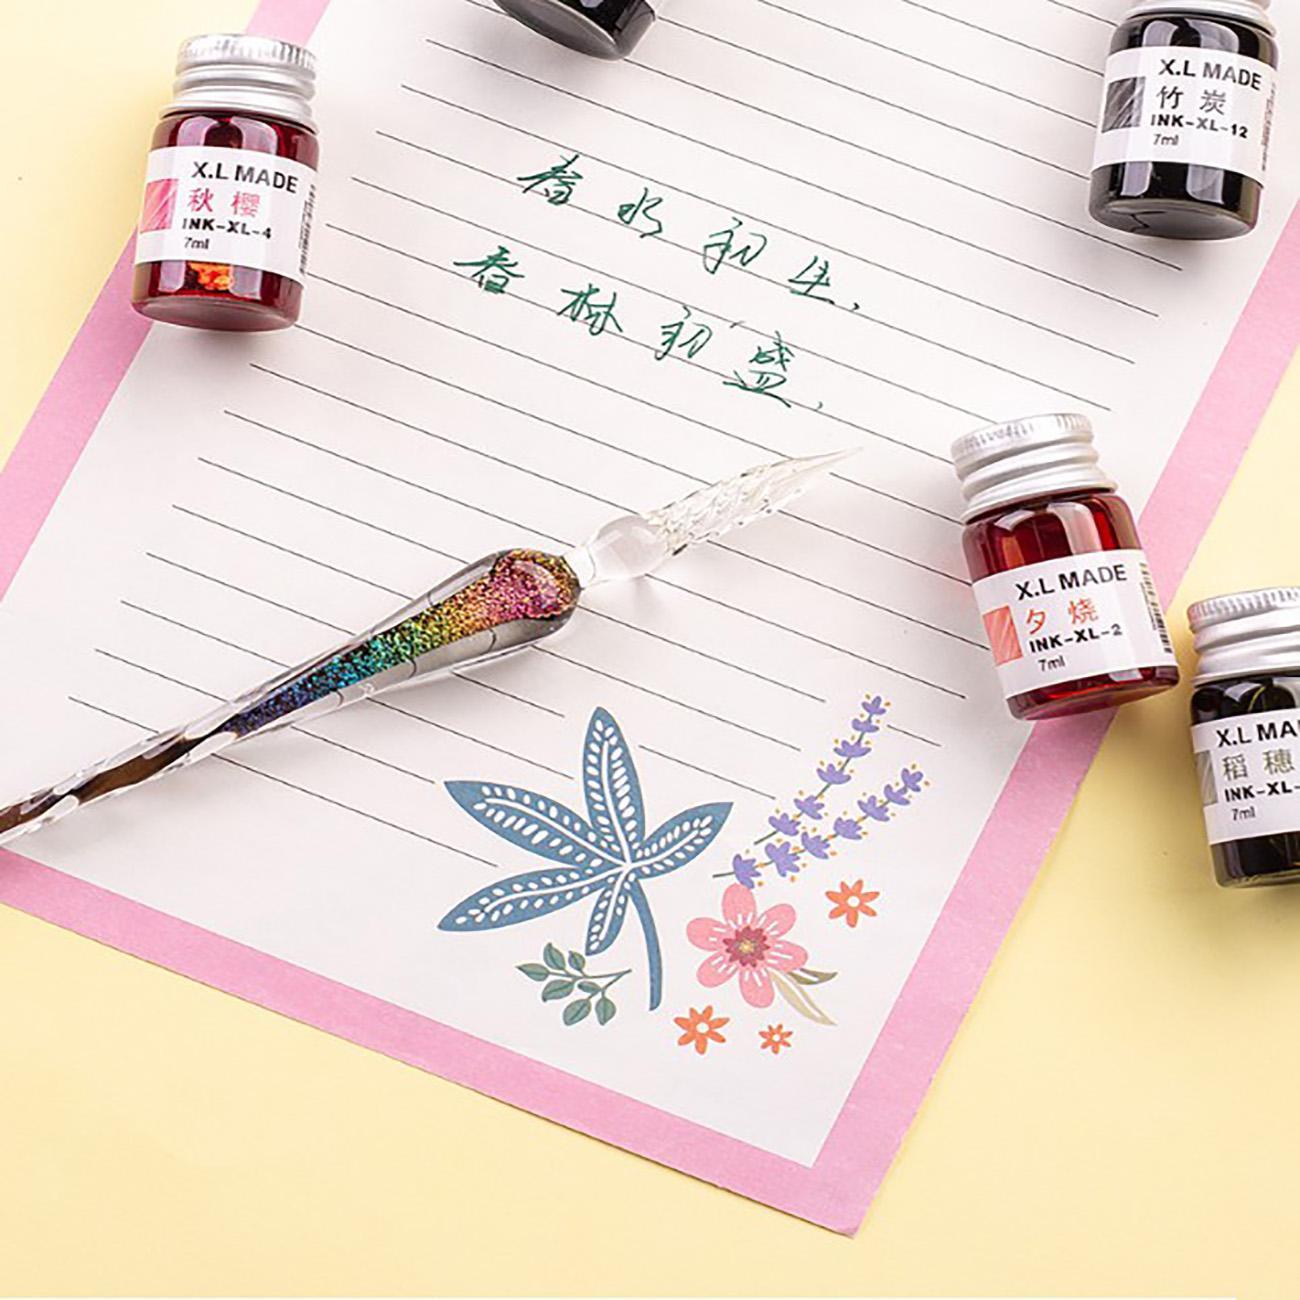 Novelty Glass Dip Nib Ink Fountain Pen Signature Pen Writing Tool 1PC Pink